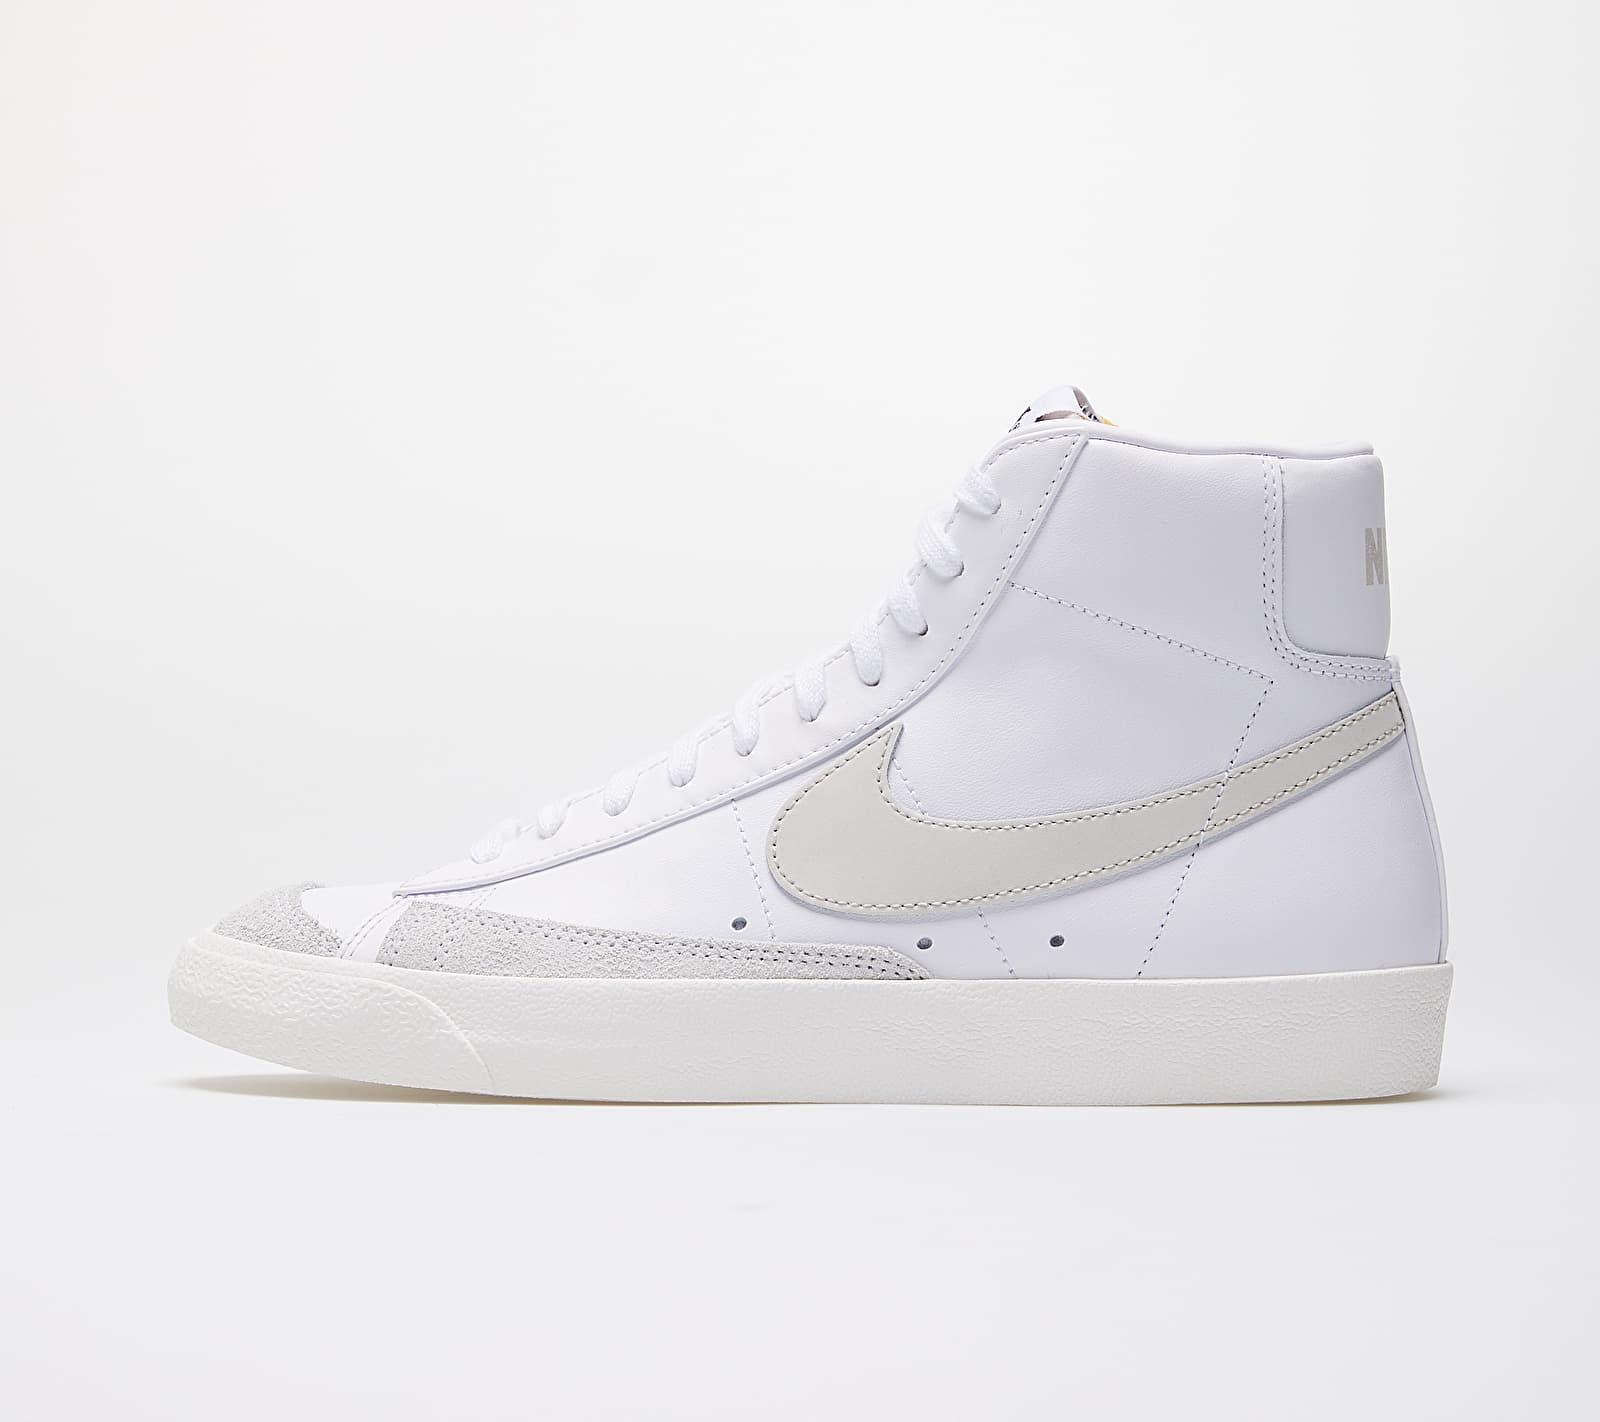 Nike Blazer Mid '77  Vintage White/ Light Bone-Sail BQ6806-106